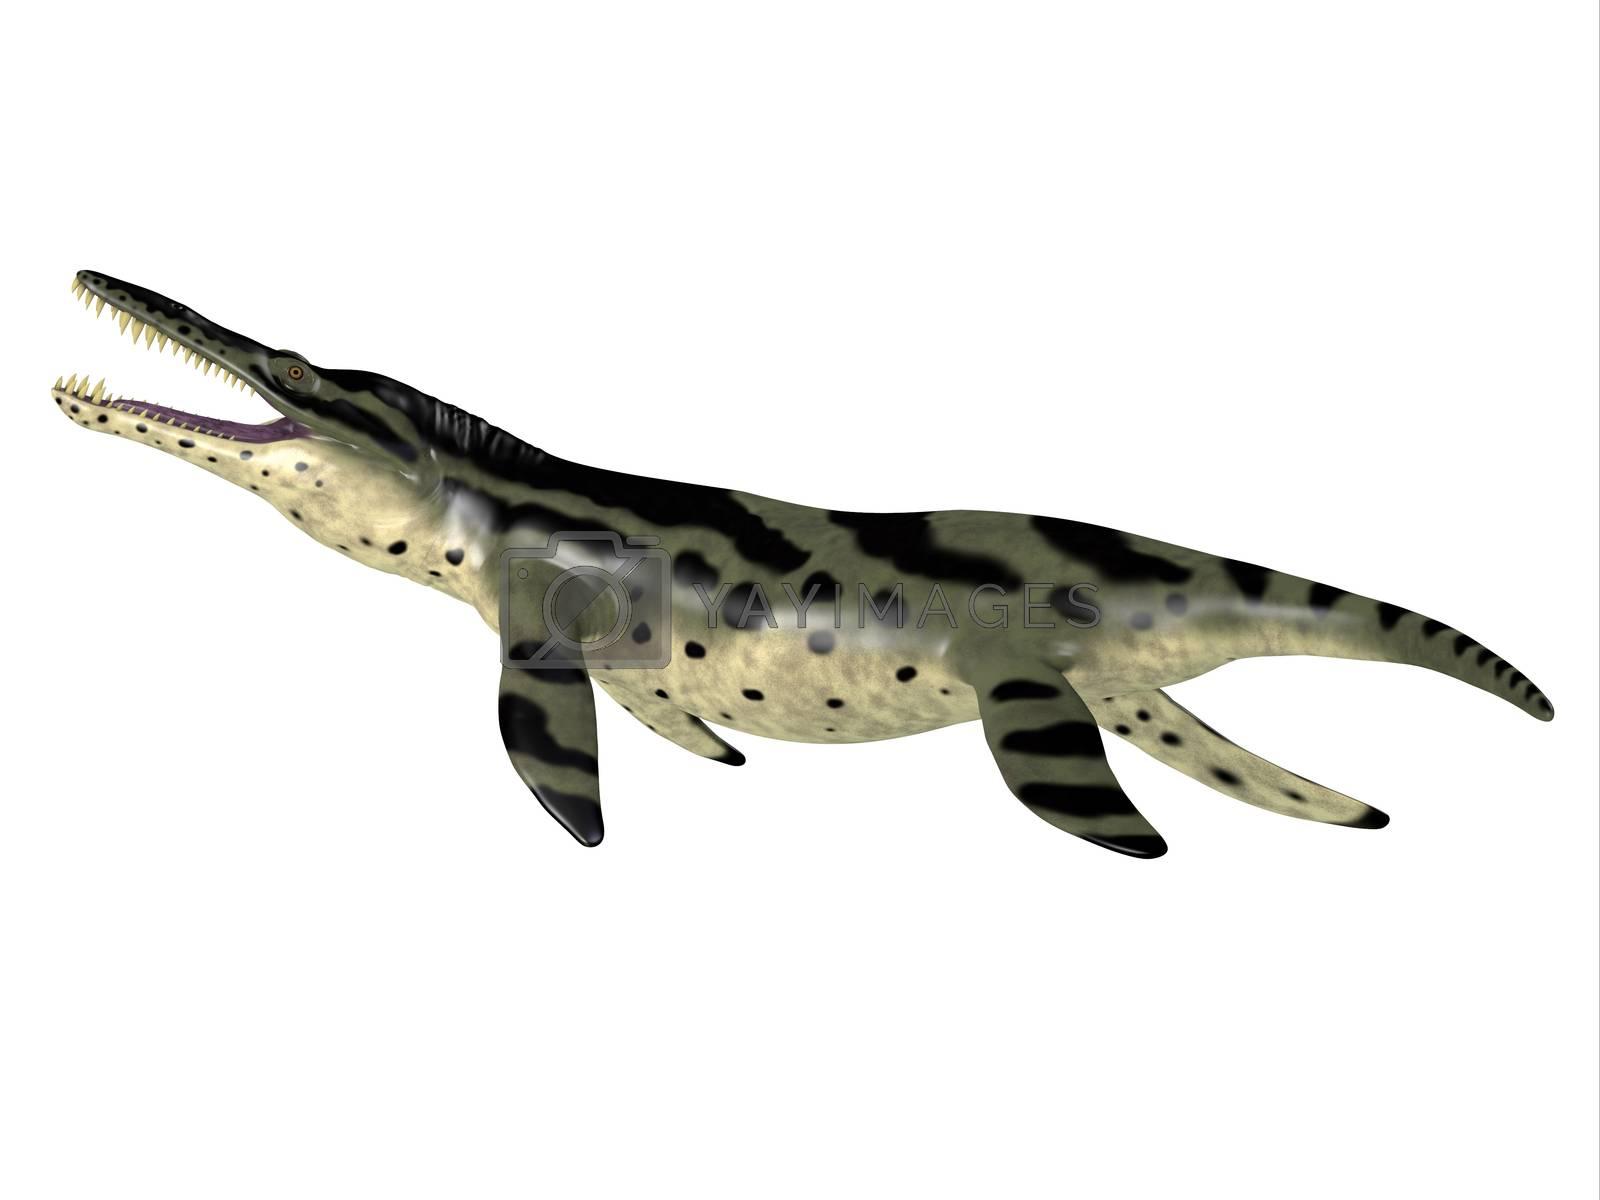 The carnivorous marine reptile Kronosaurus lived in the seas of Australia during the Cretaceous Period.